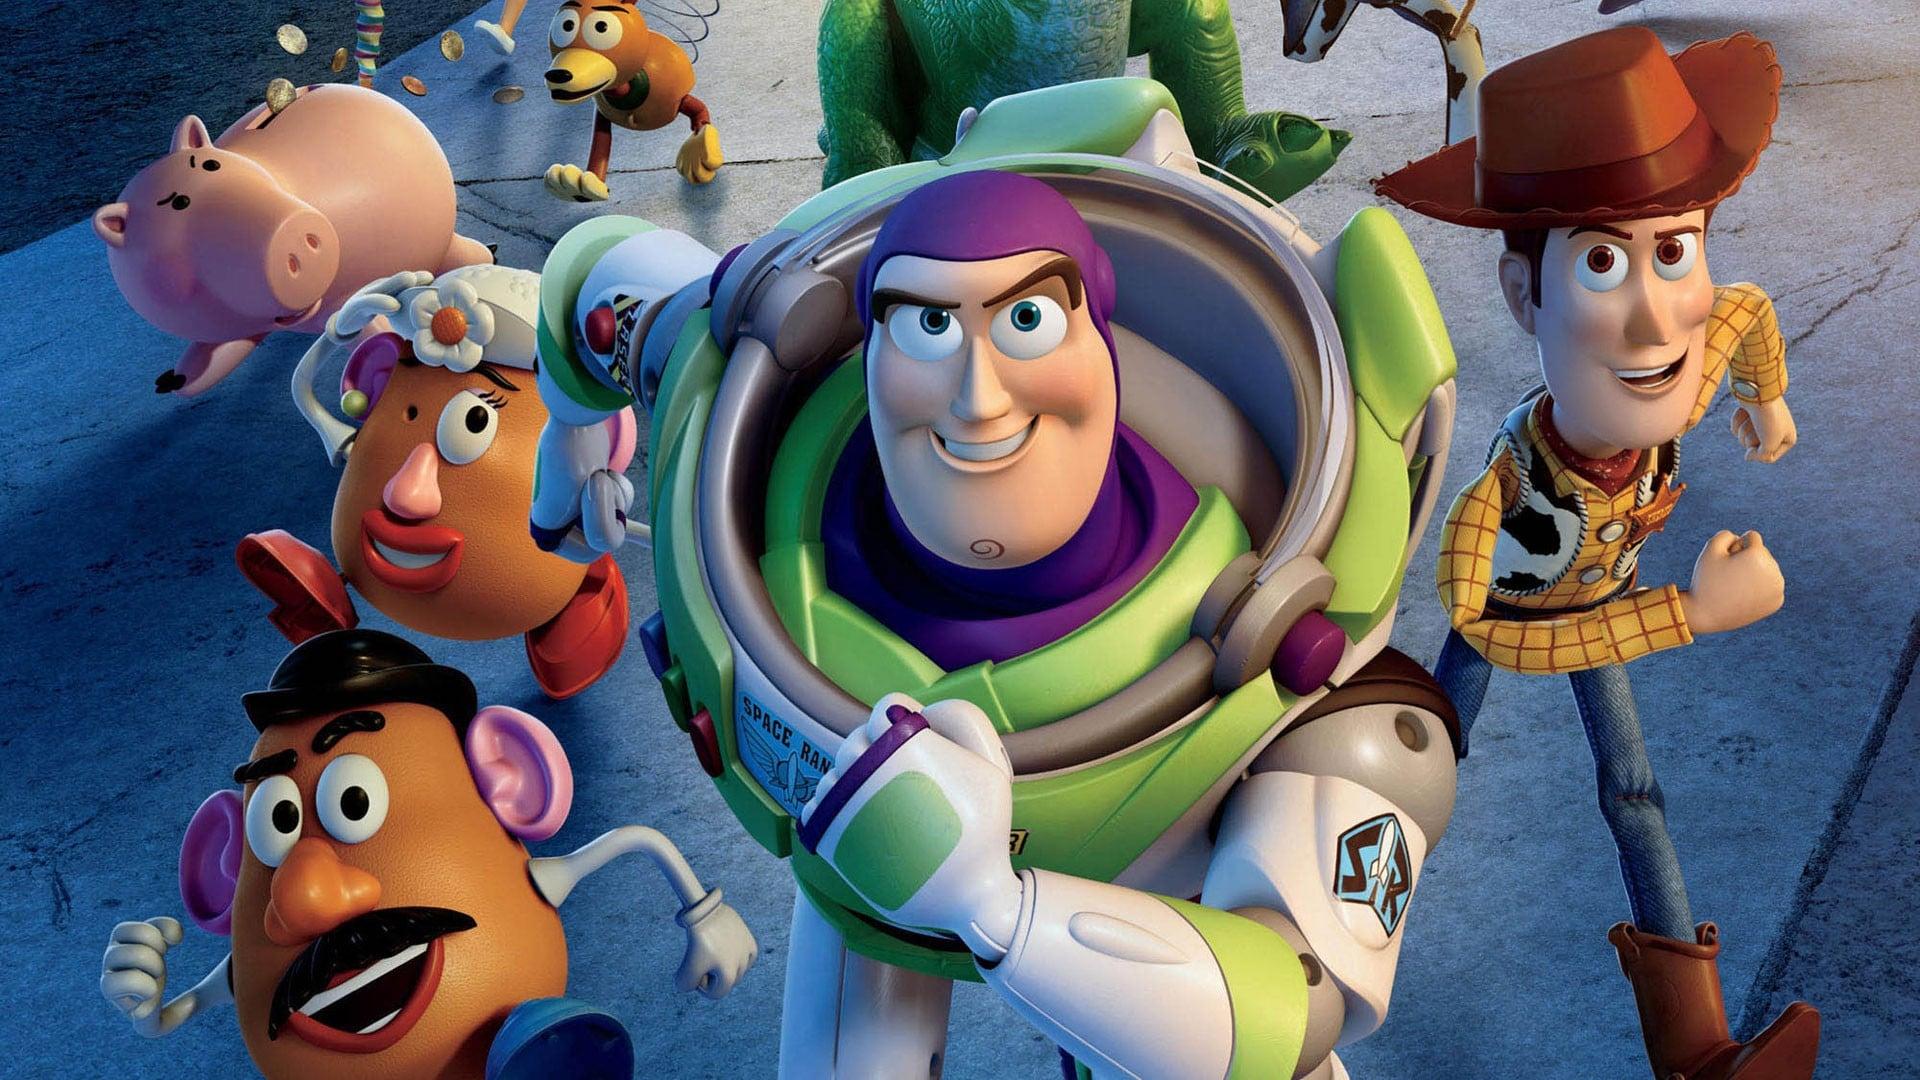 Contraportada Toy Story 2